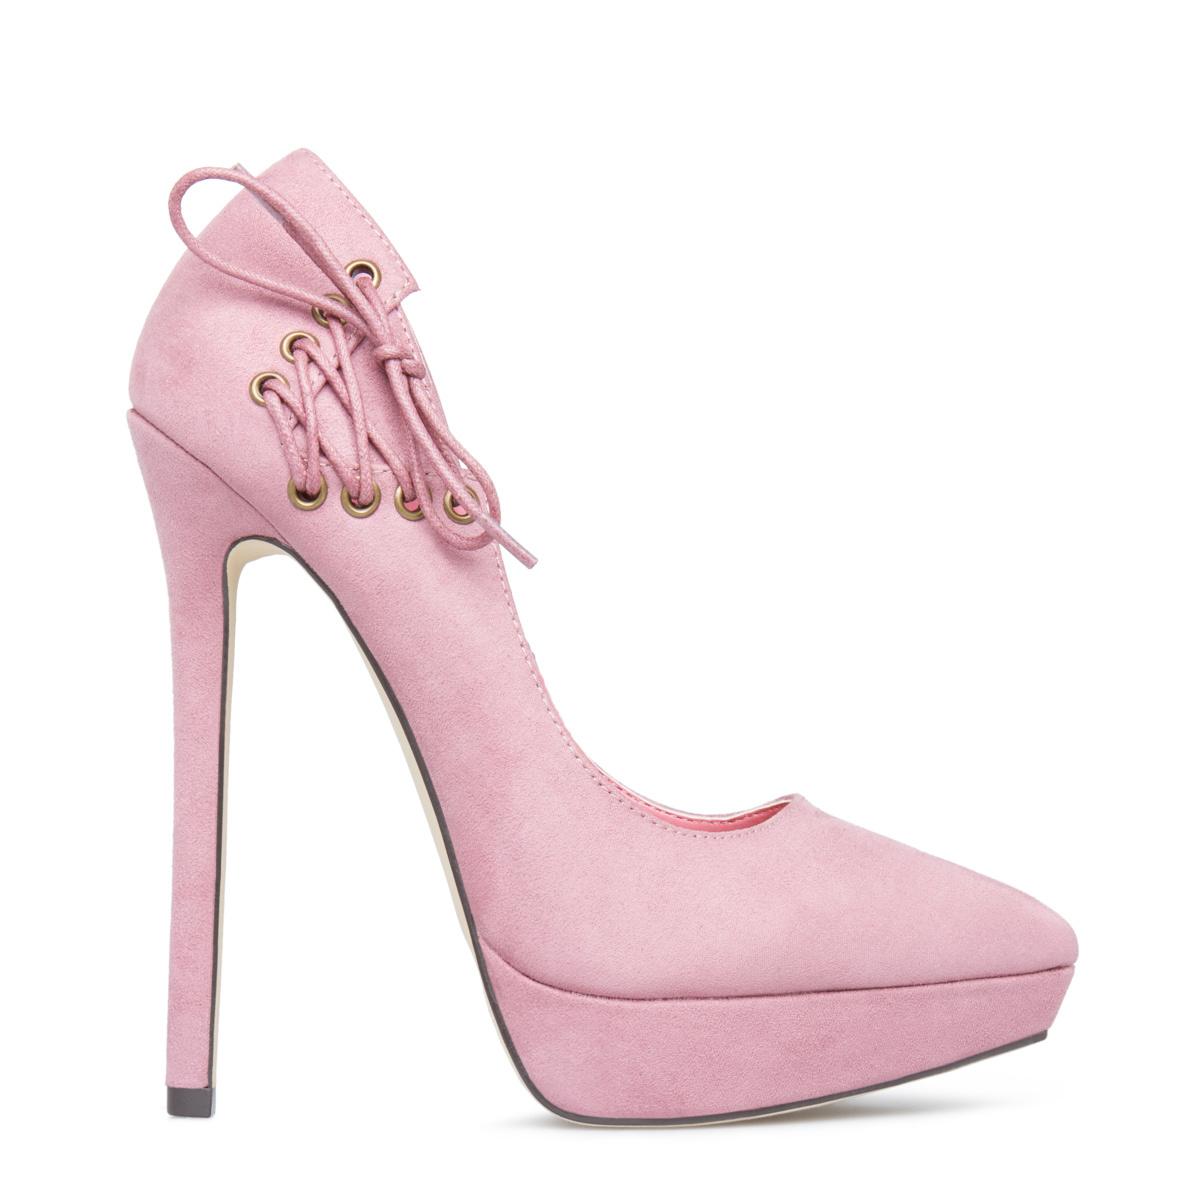 Designer Extra Wide Shoes